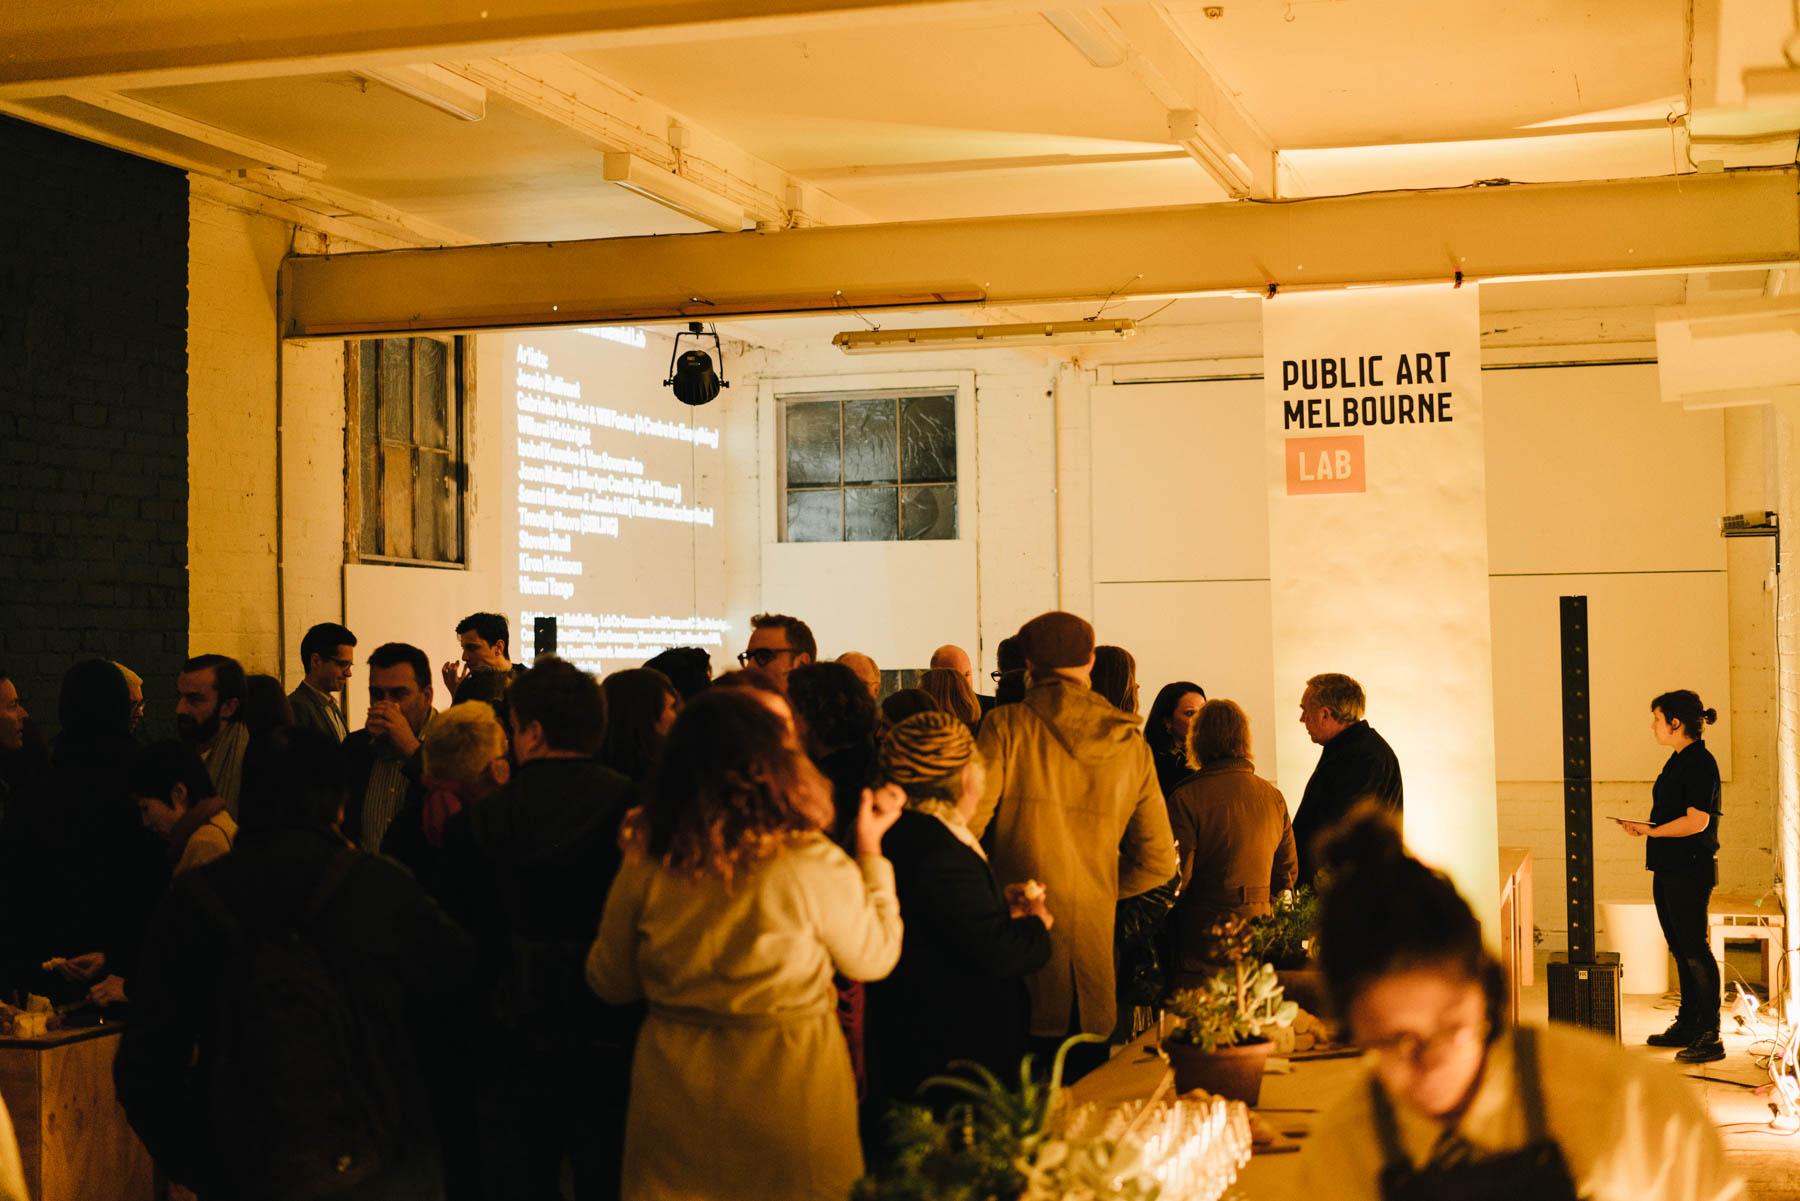 Biennial Lab welcome. Photo: Kristoffer Paulsen.